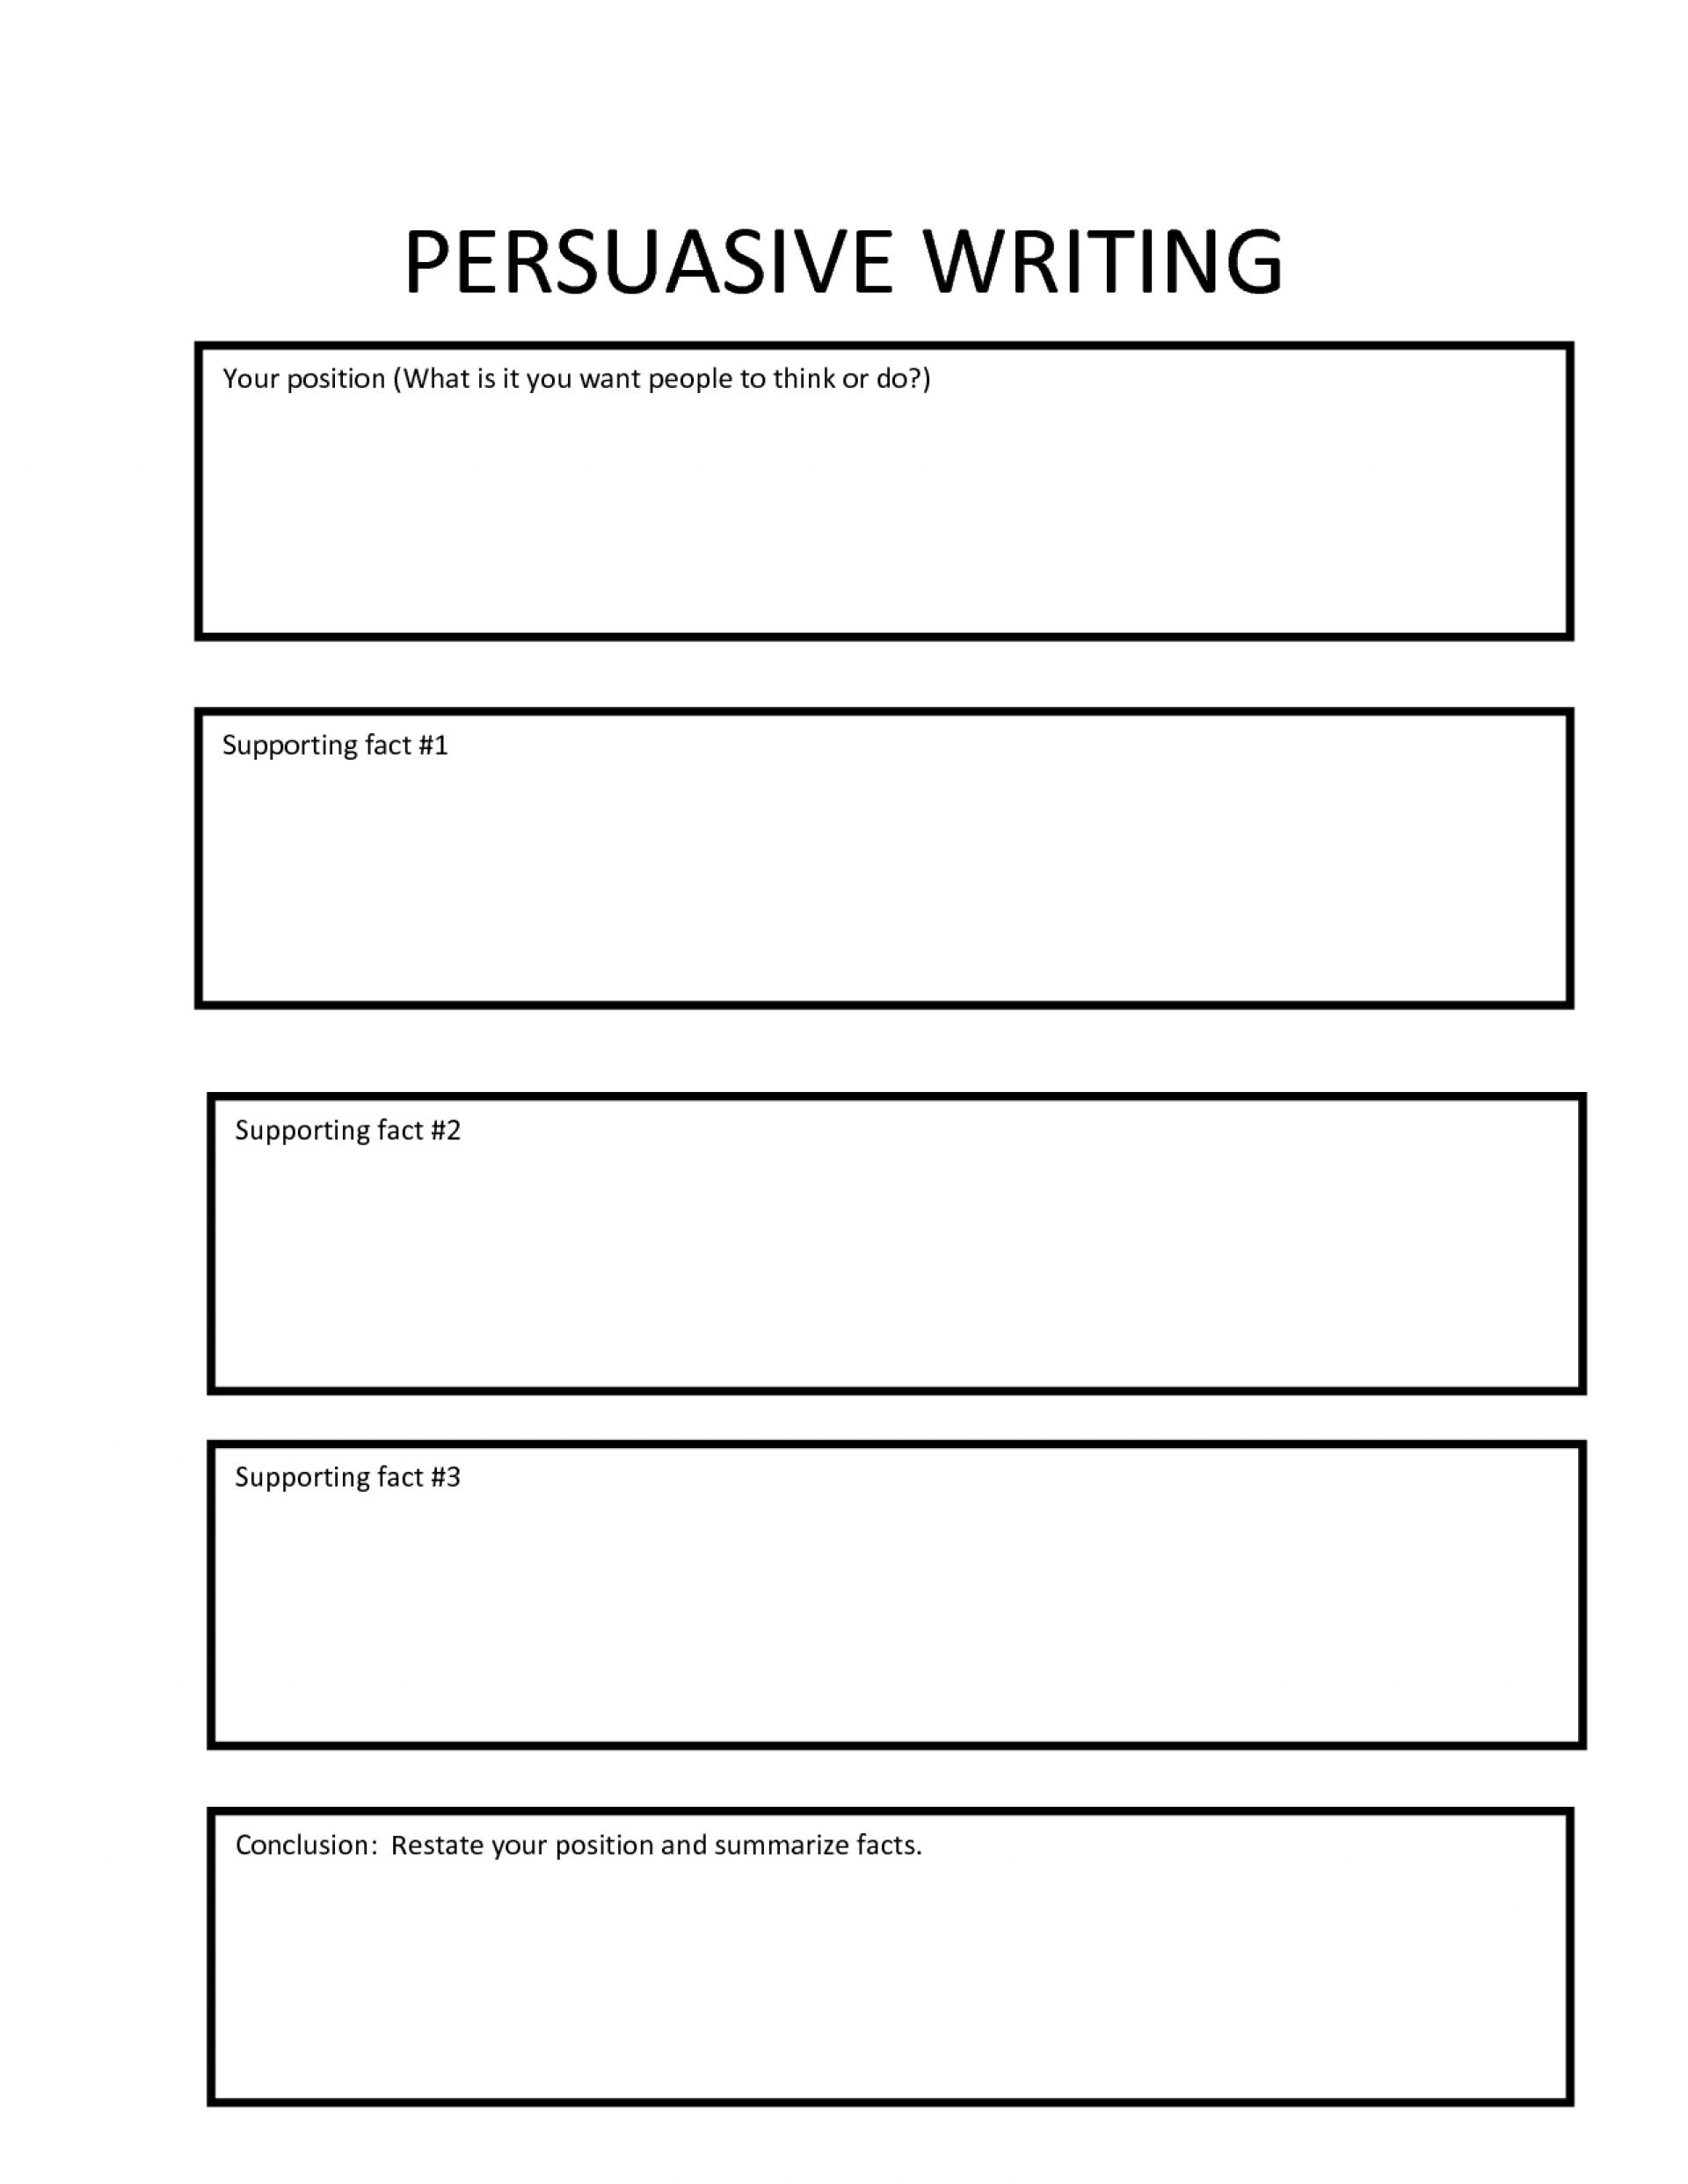 004 Persuasive Essay Graphic Organizer Amazing Argumentative Middle School Pdf Writing 5th Grade Answers 1920